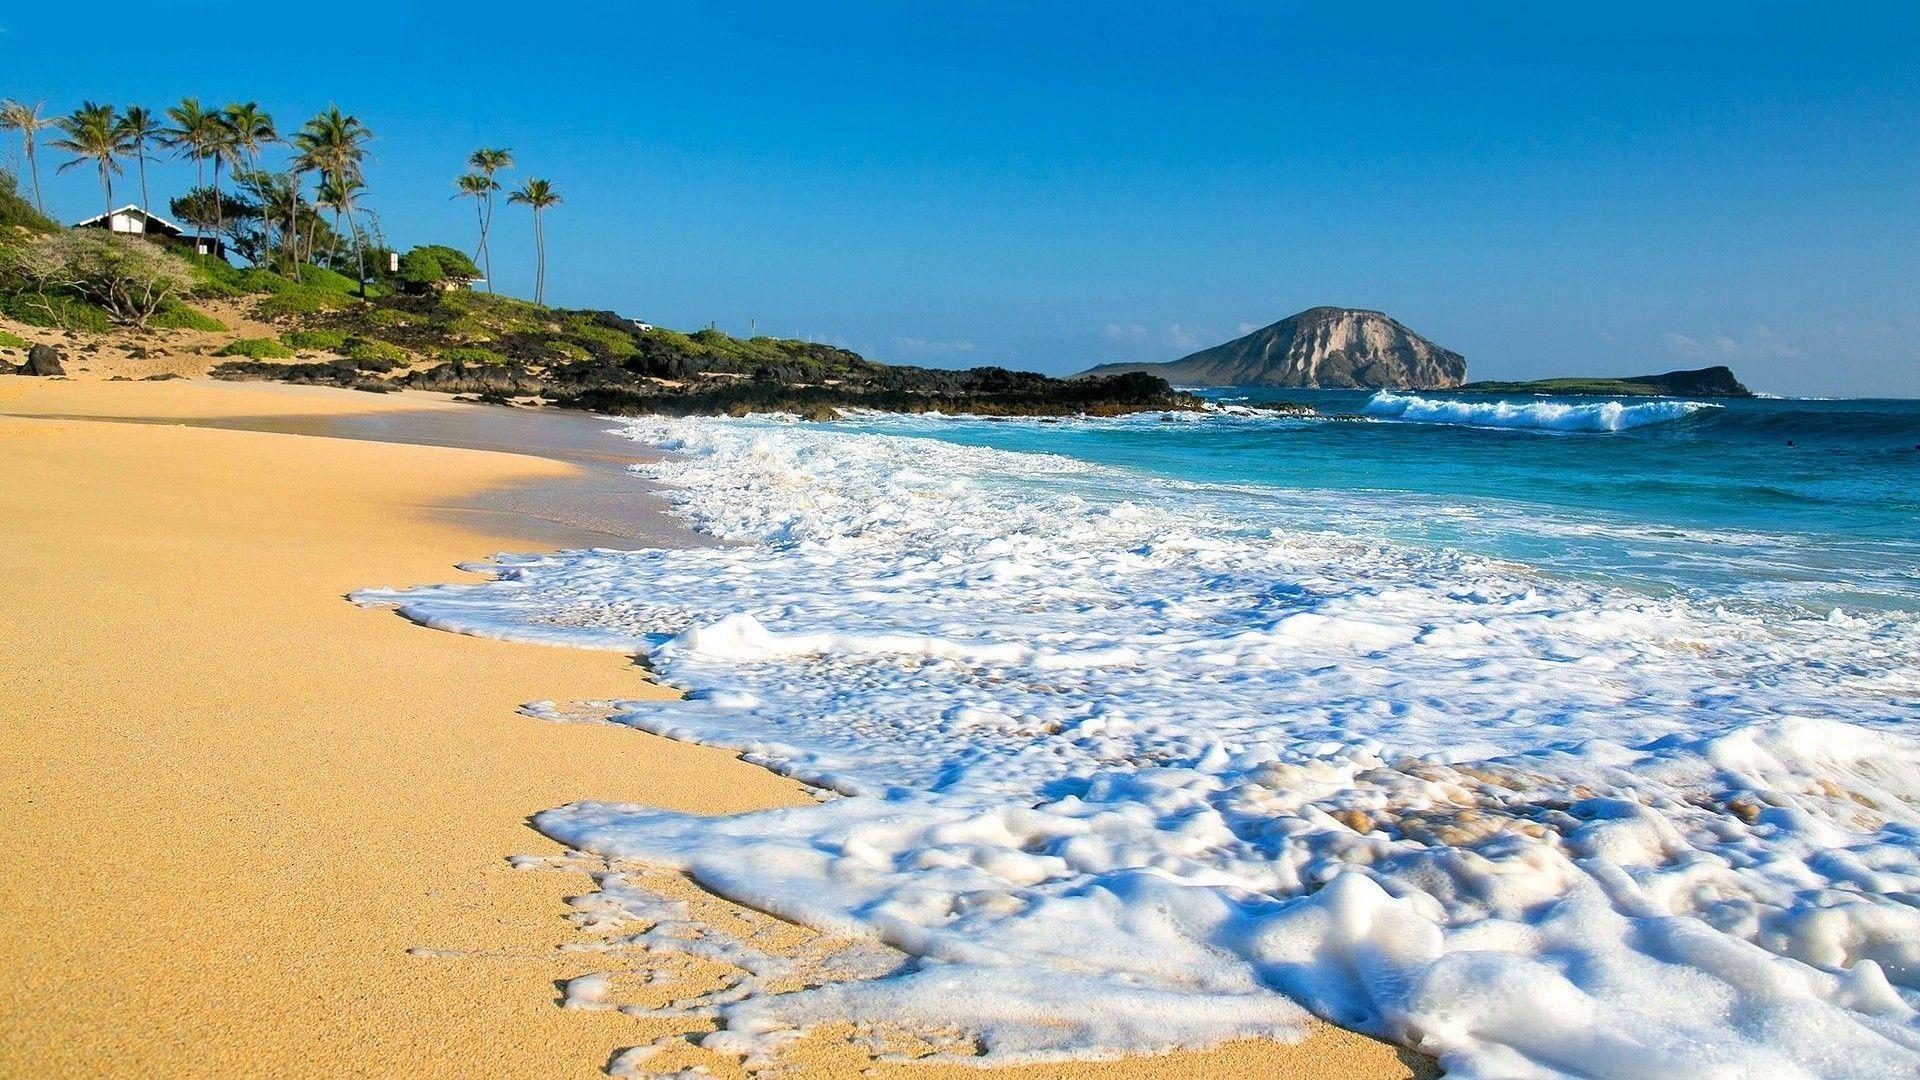 Res: 1920x1080, Hawaii Beach HD Wallpaper  For Desktop - Beraplan.com